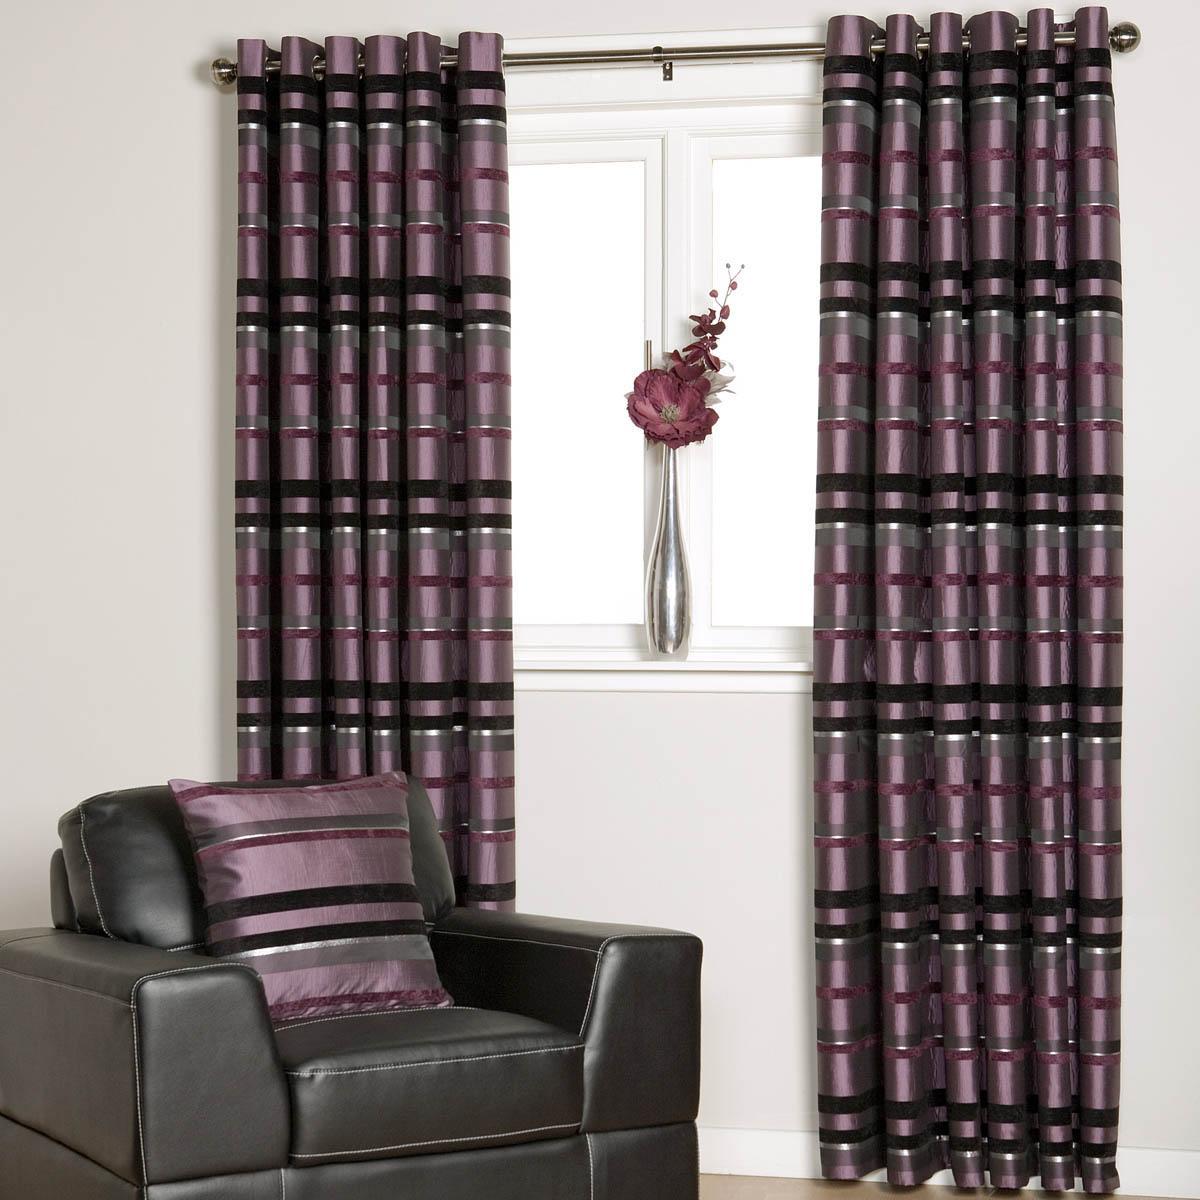 Delightful Vanity Eyelet Curtains